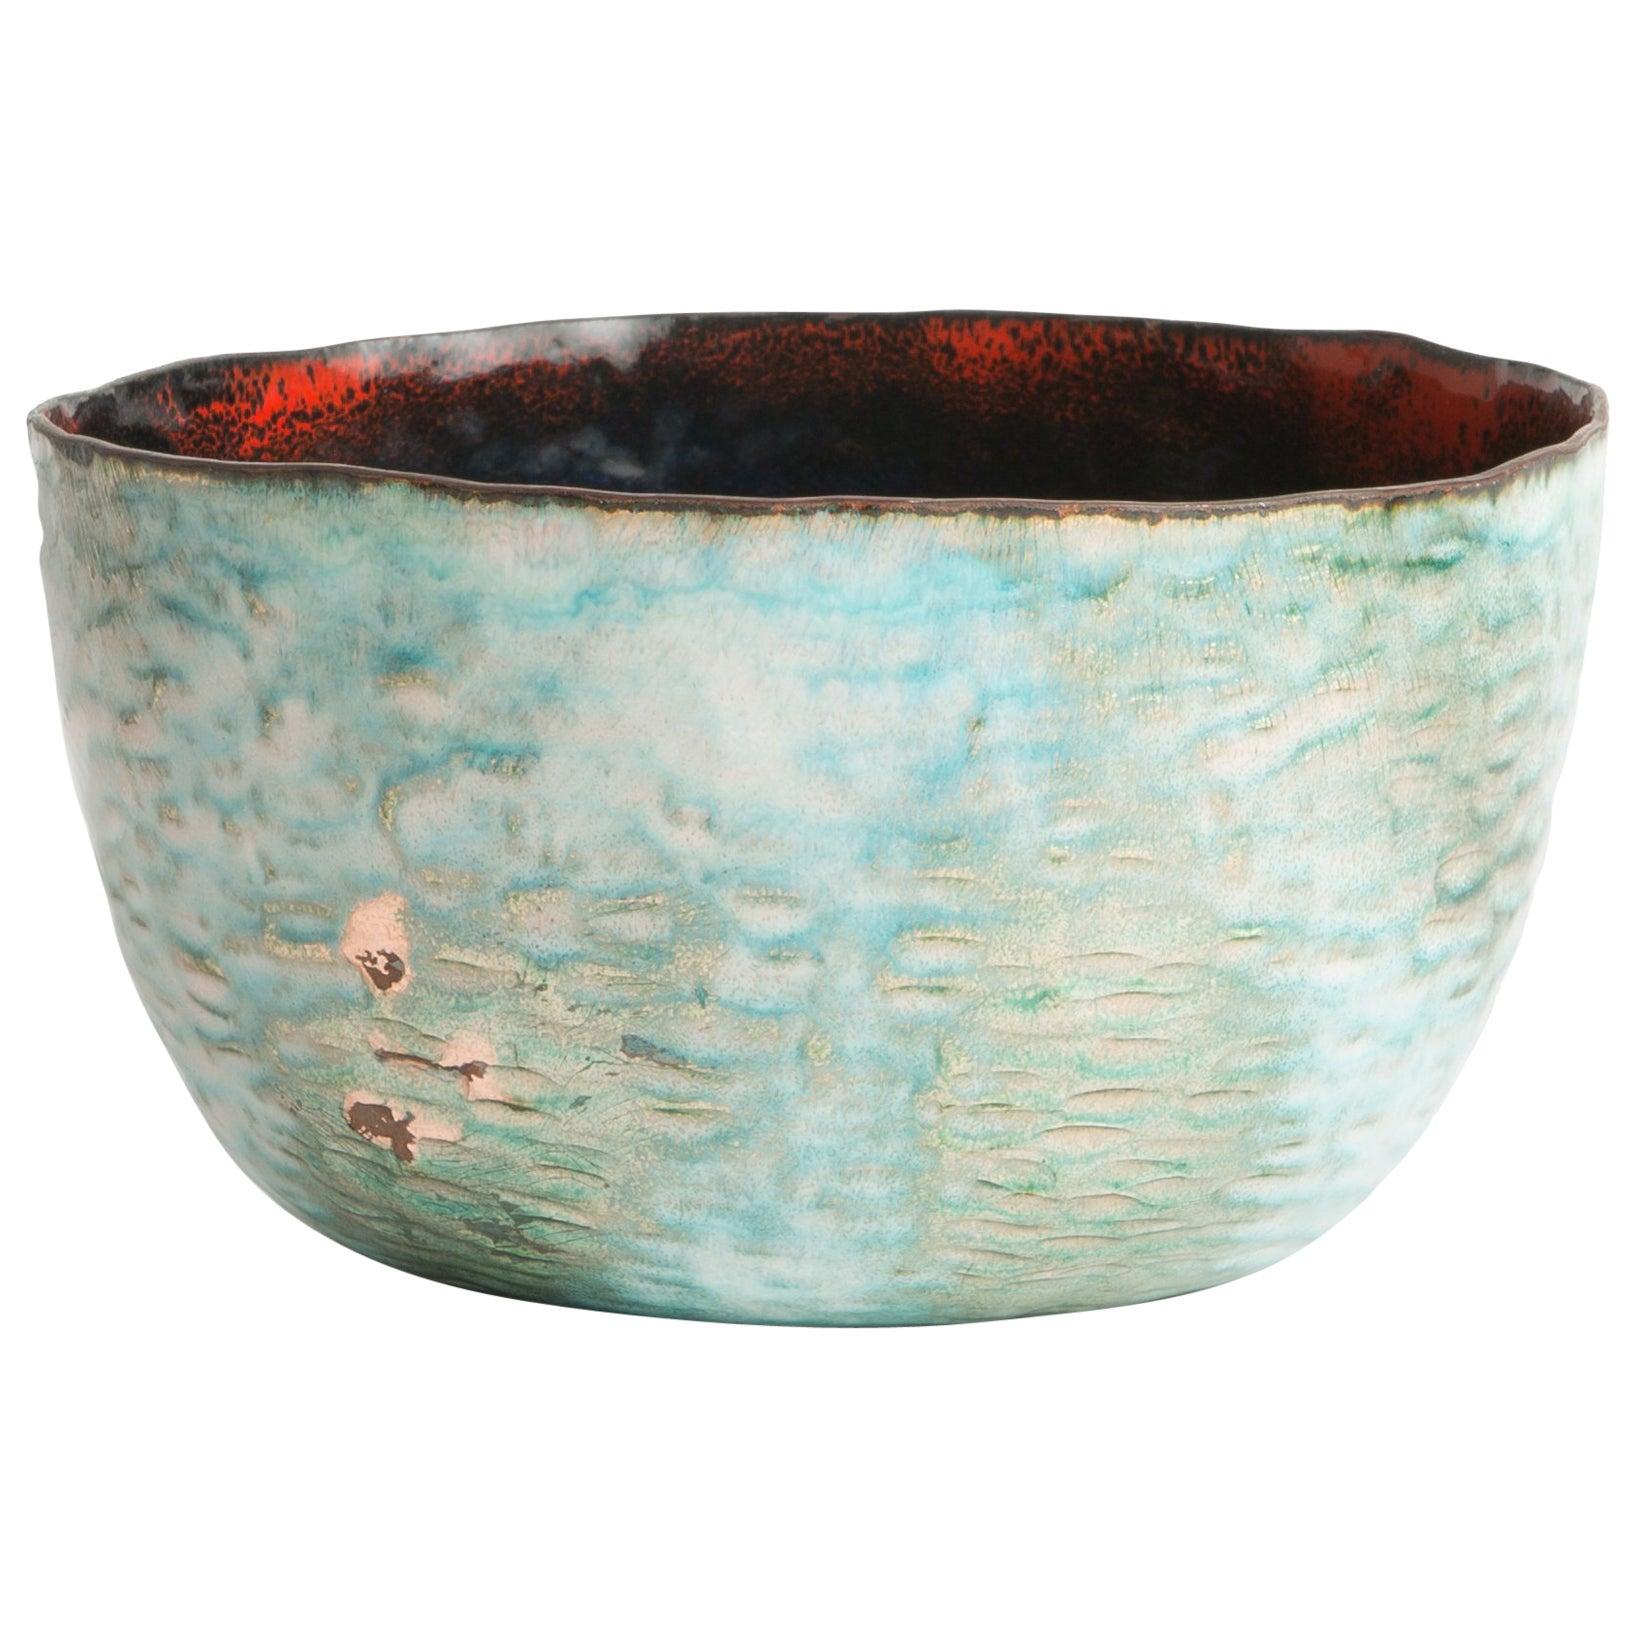 Blue Green Red Enameled Paolo De Poli Bowl